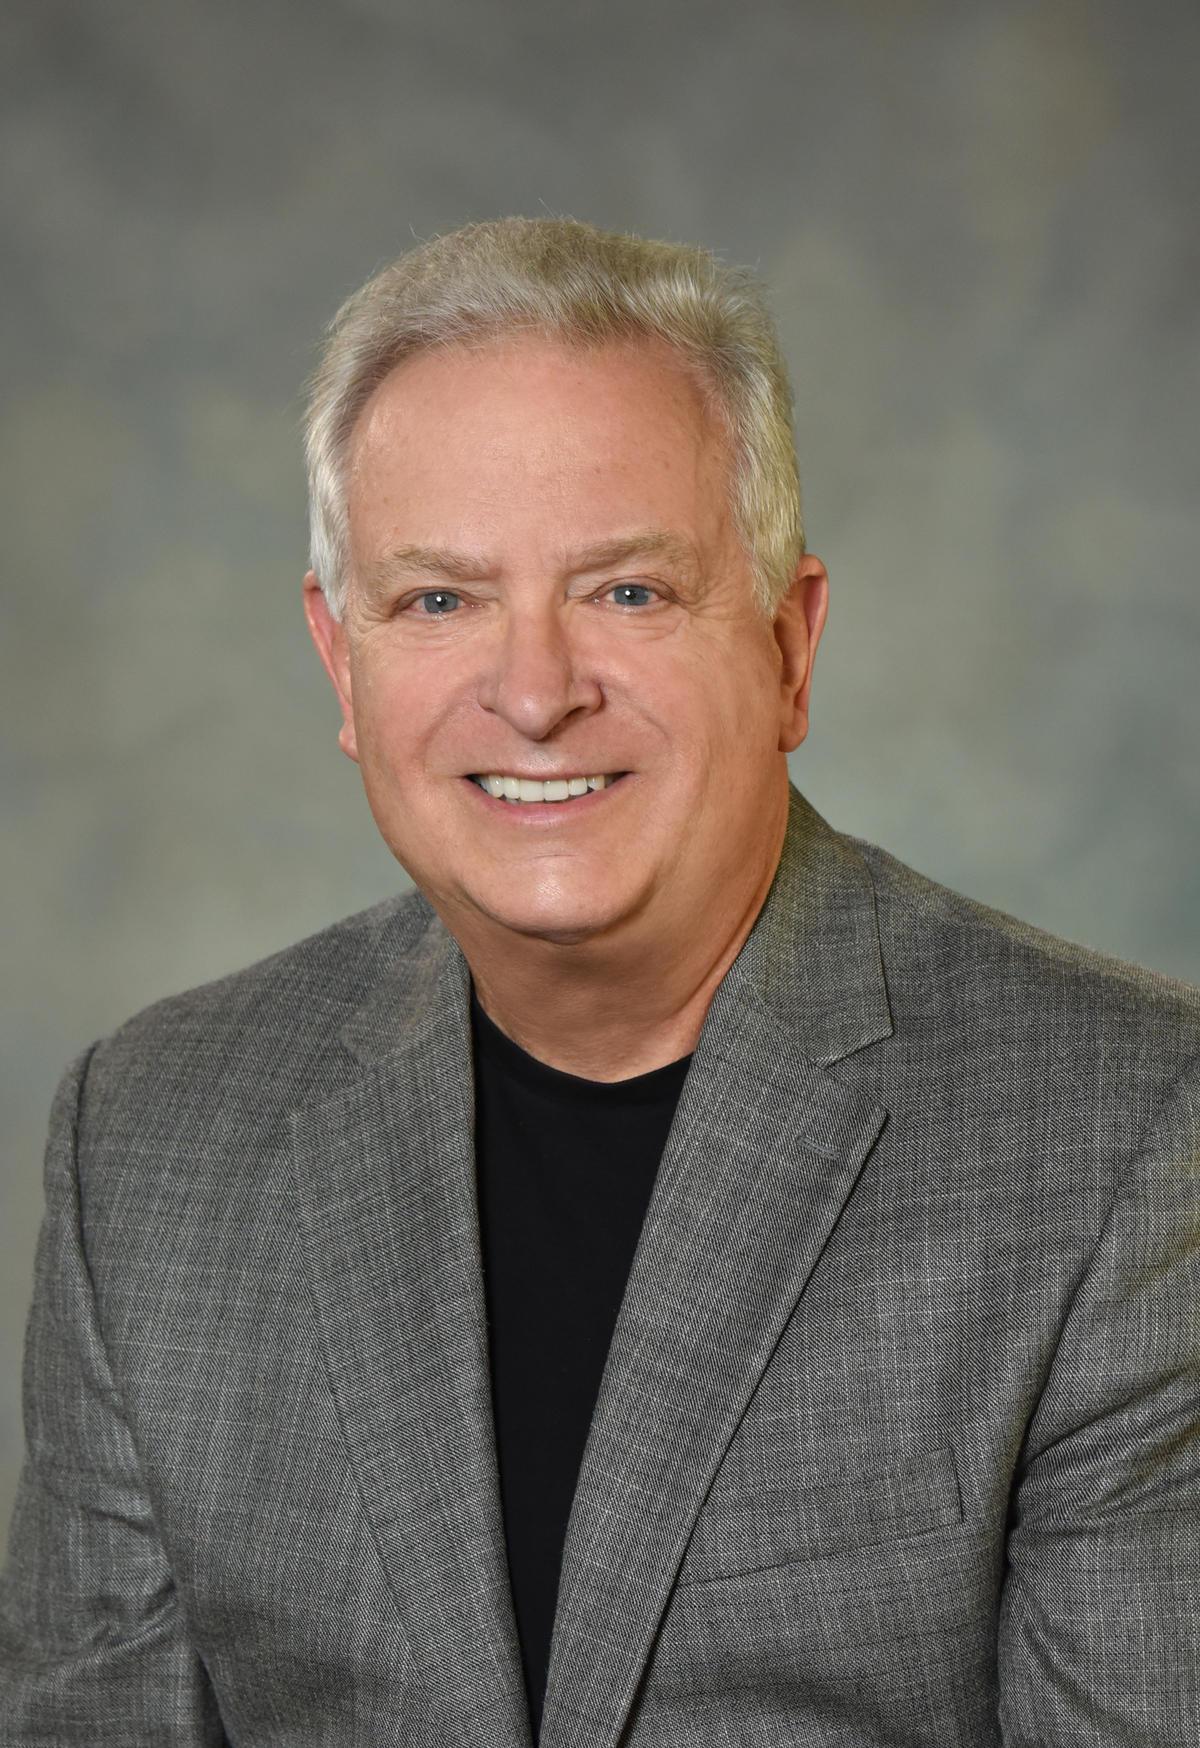 US music director retires, 200 want his job